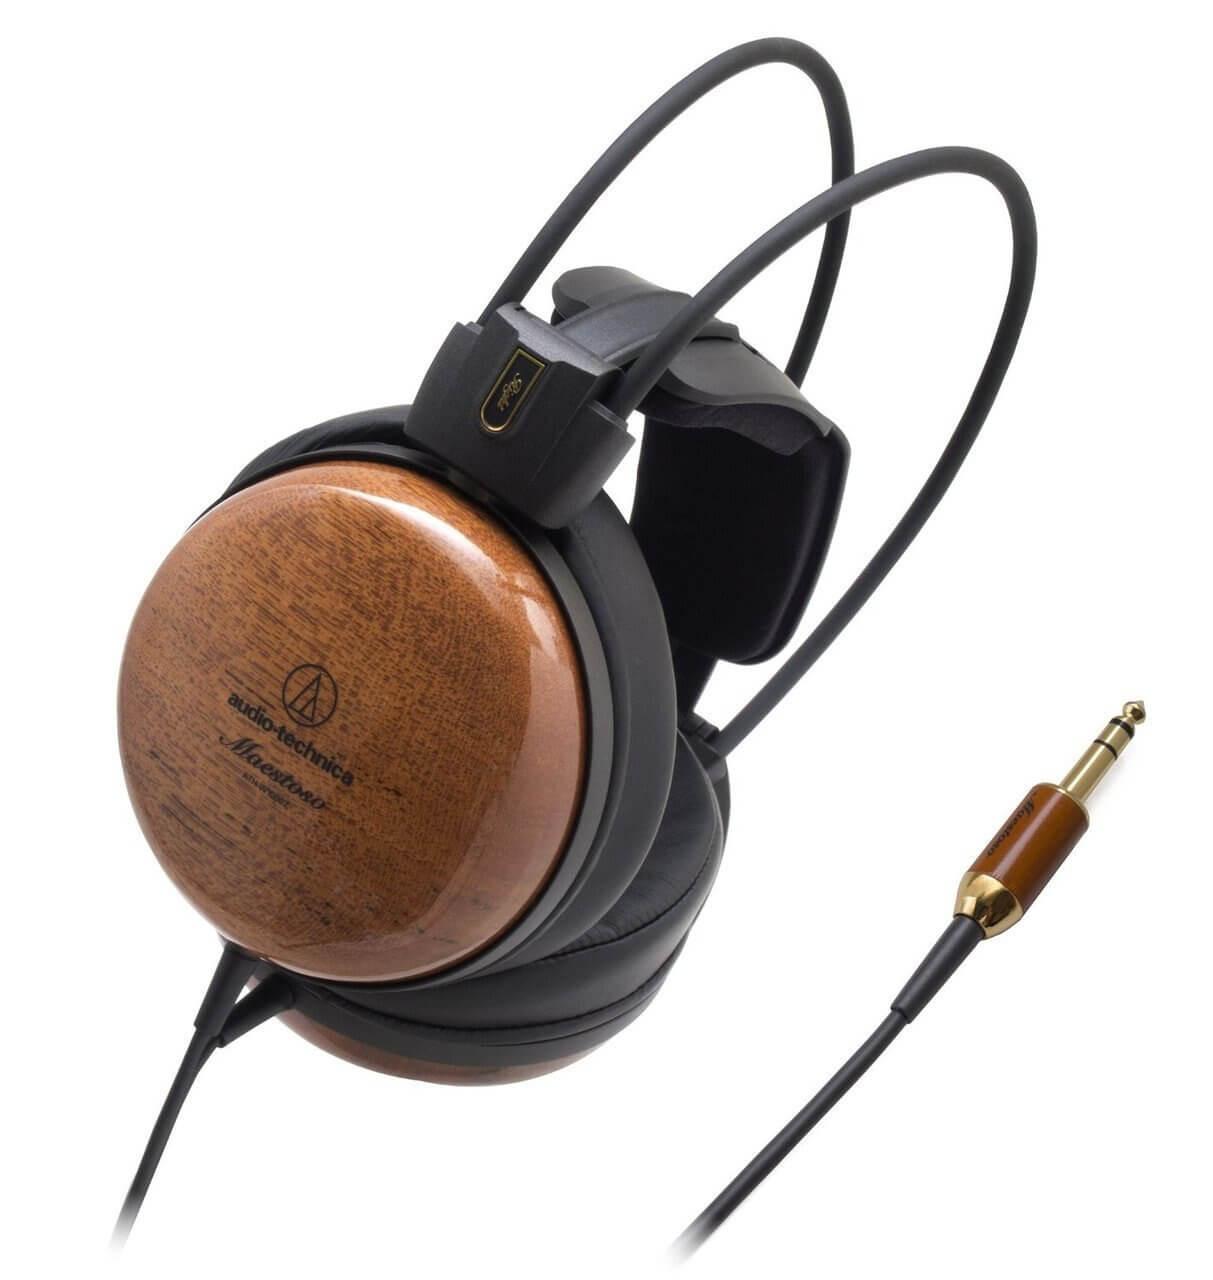 Audio Technica ATH-W1000Z Wooden Headphones